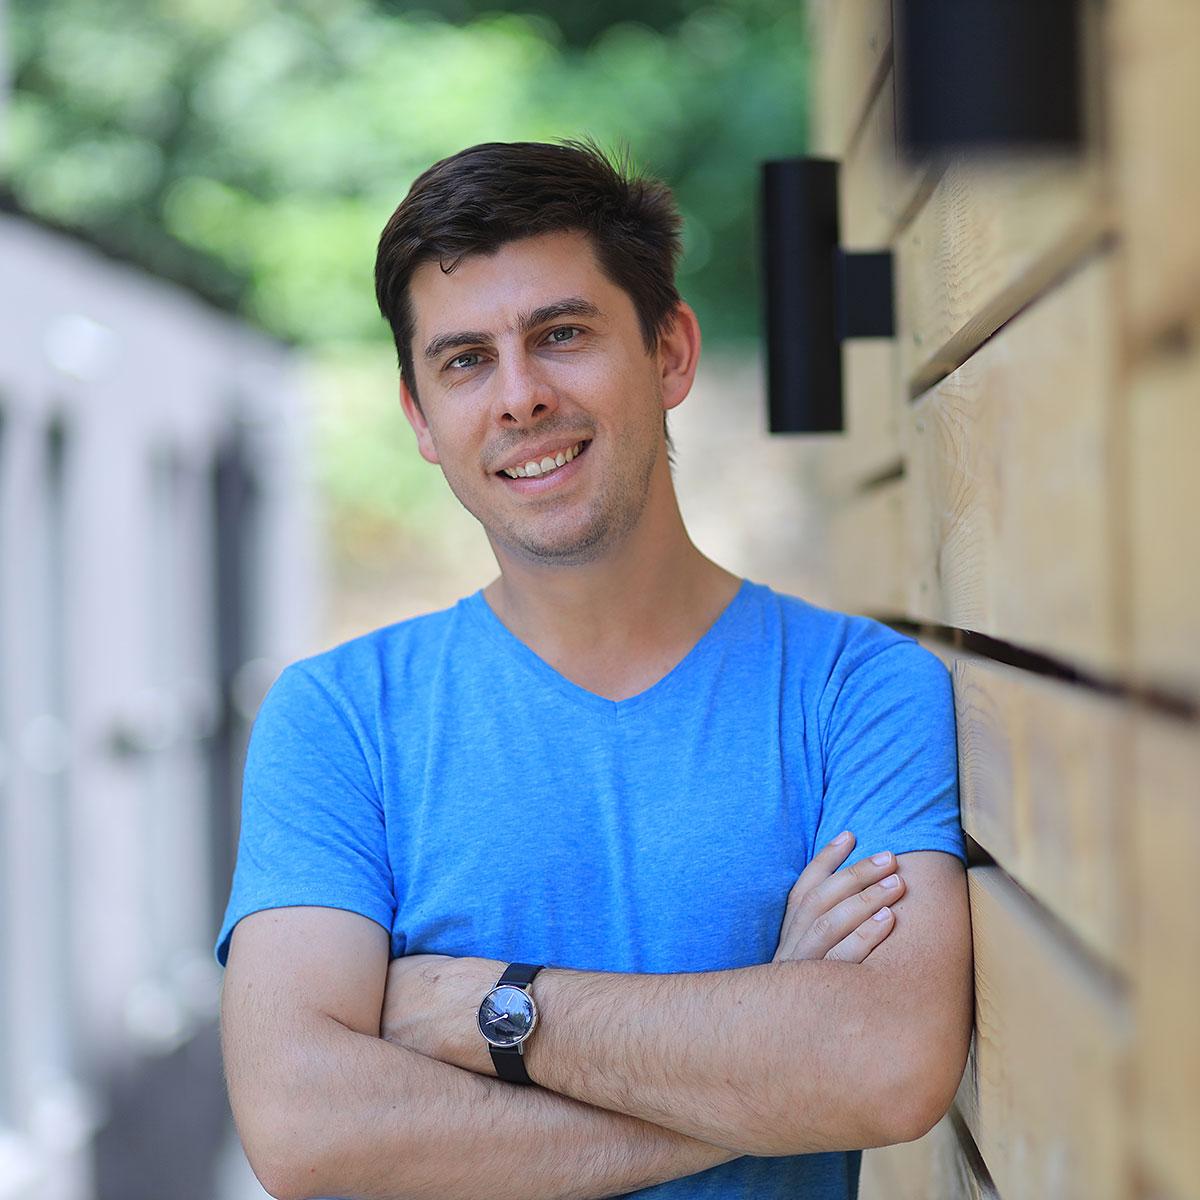 Pavel Tasev